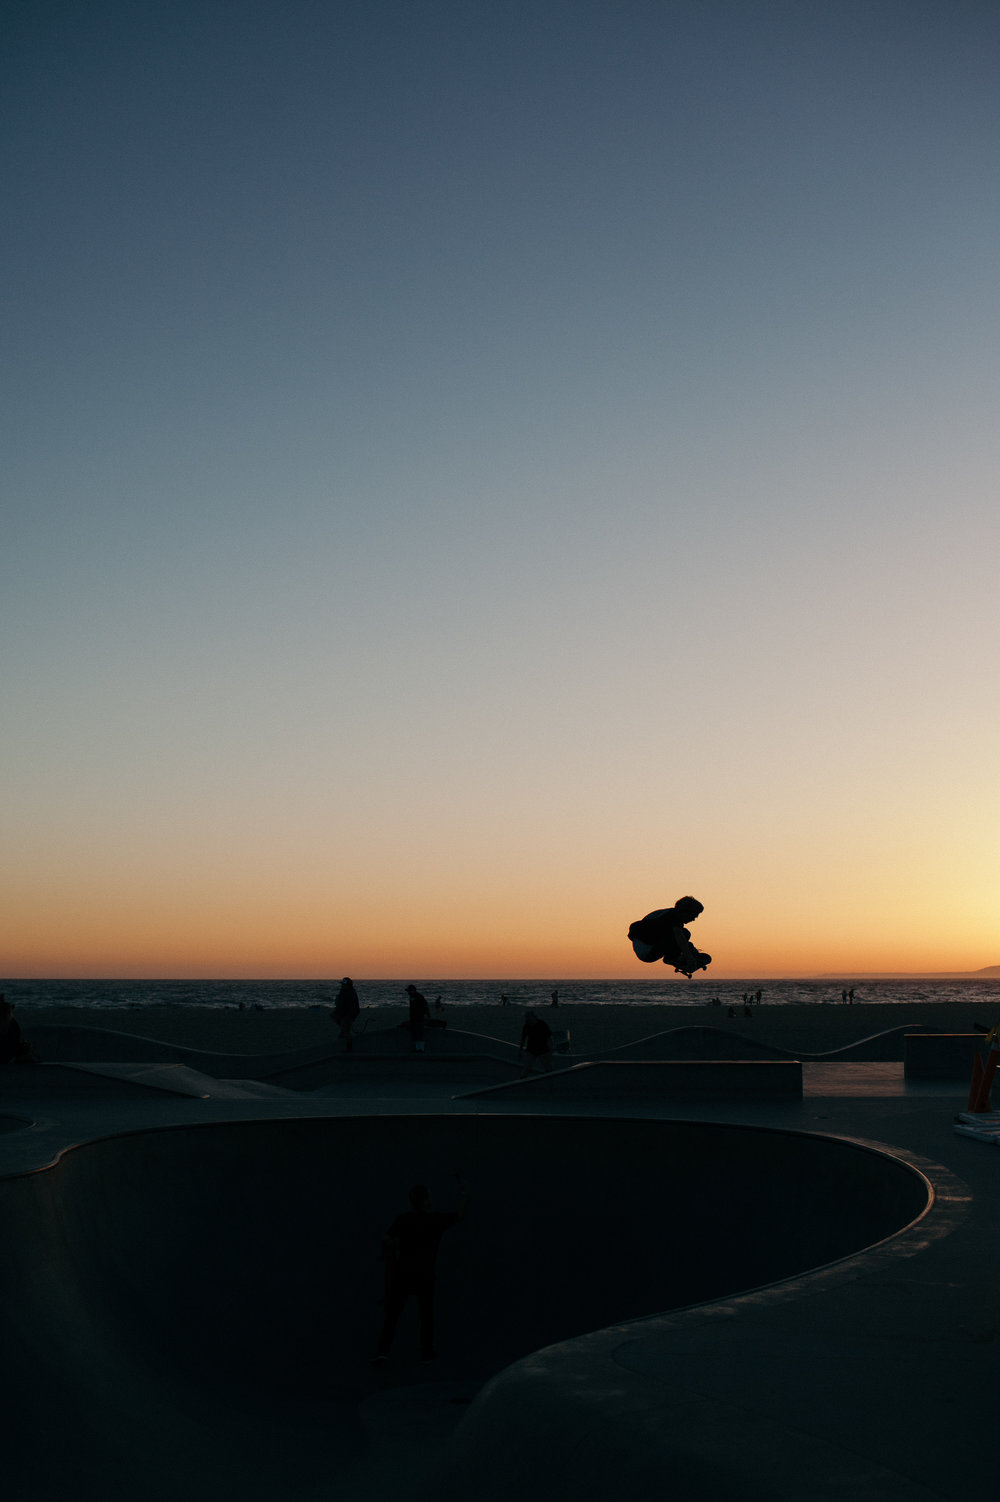 venice skatepark sunset venice beach california